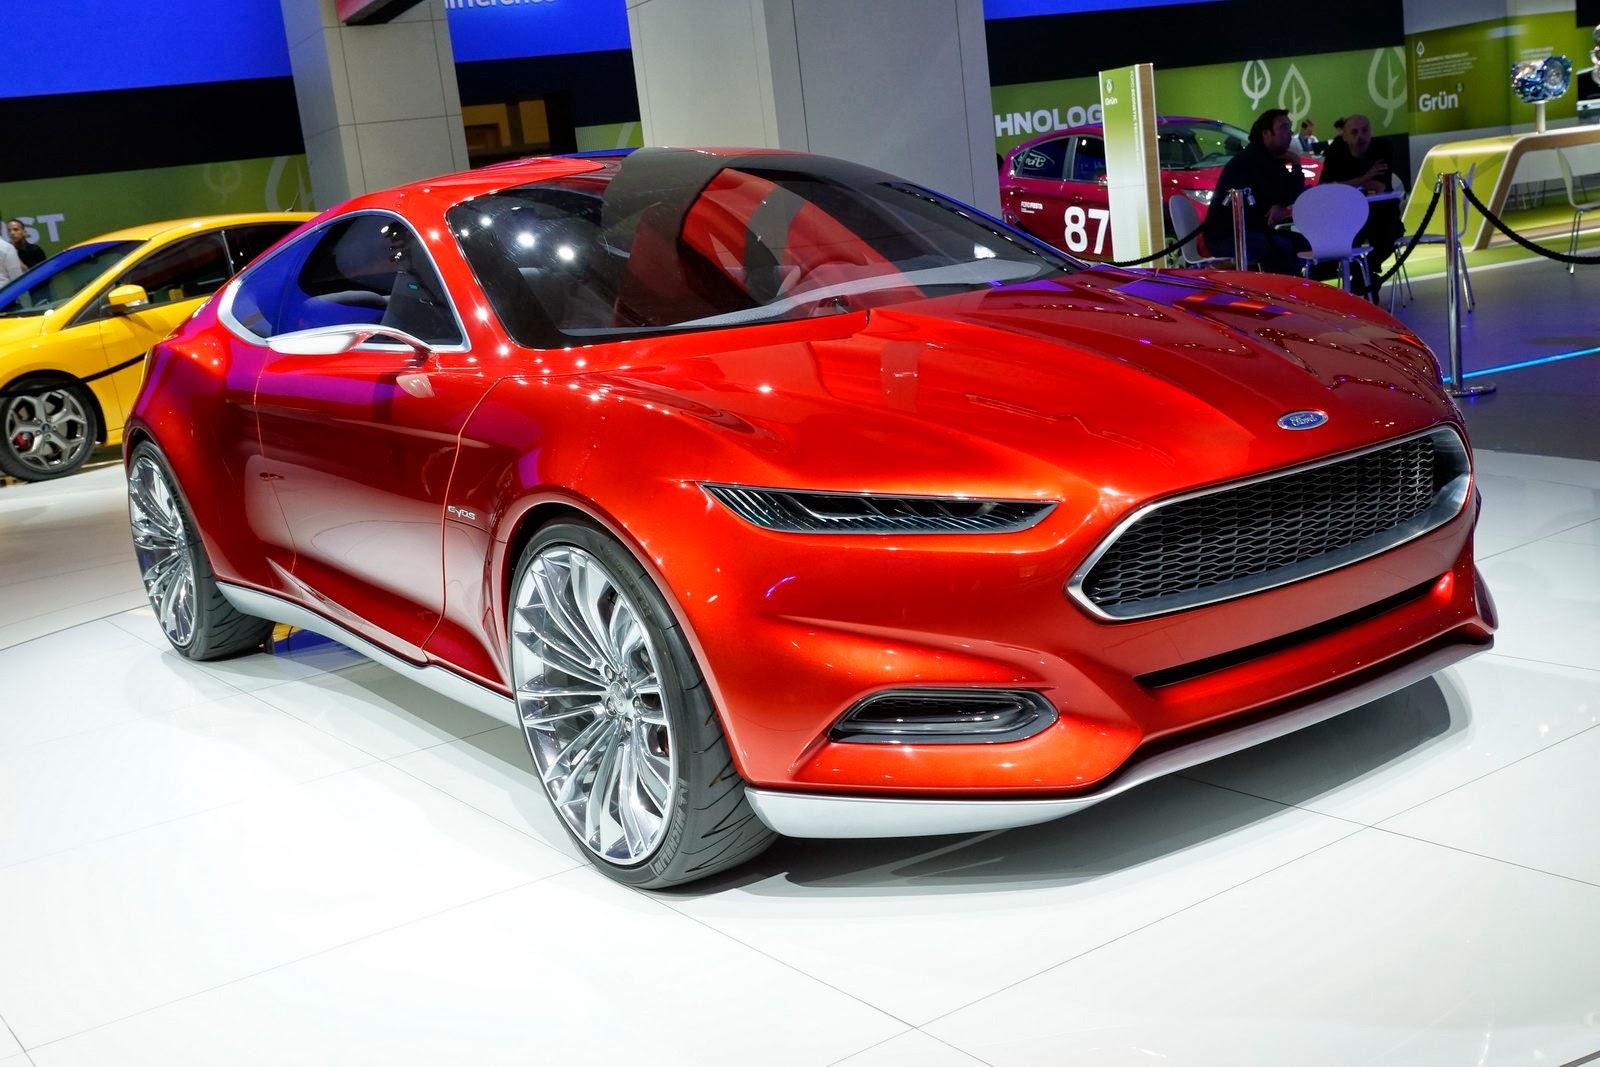 New Car Models: Ford mustang 2015